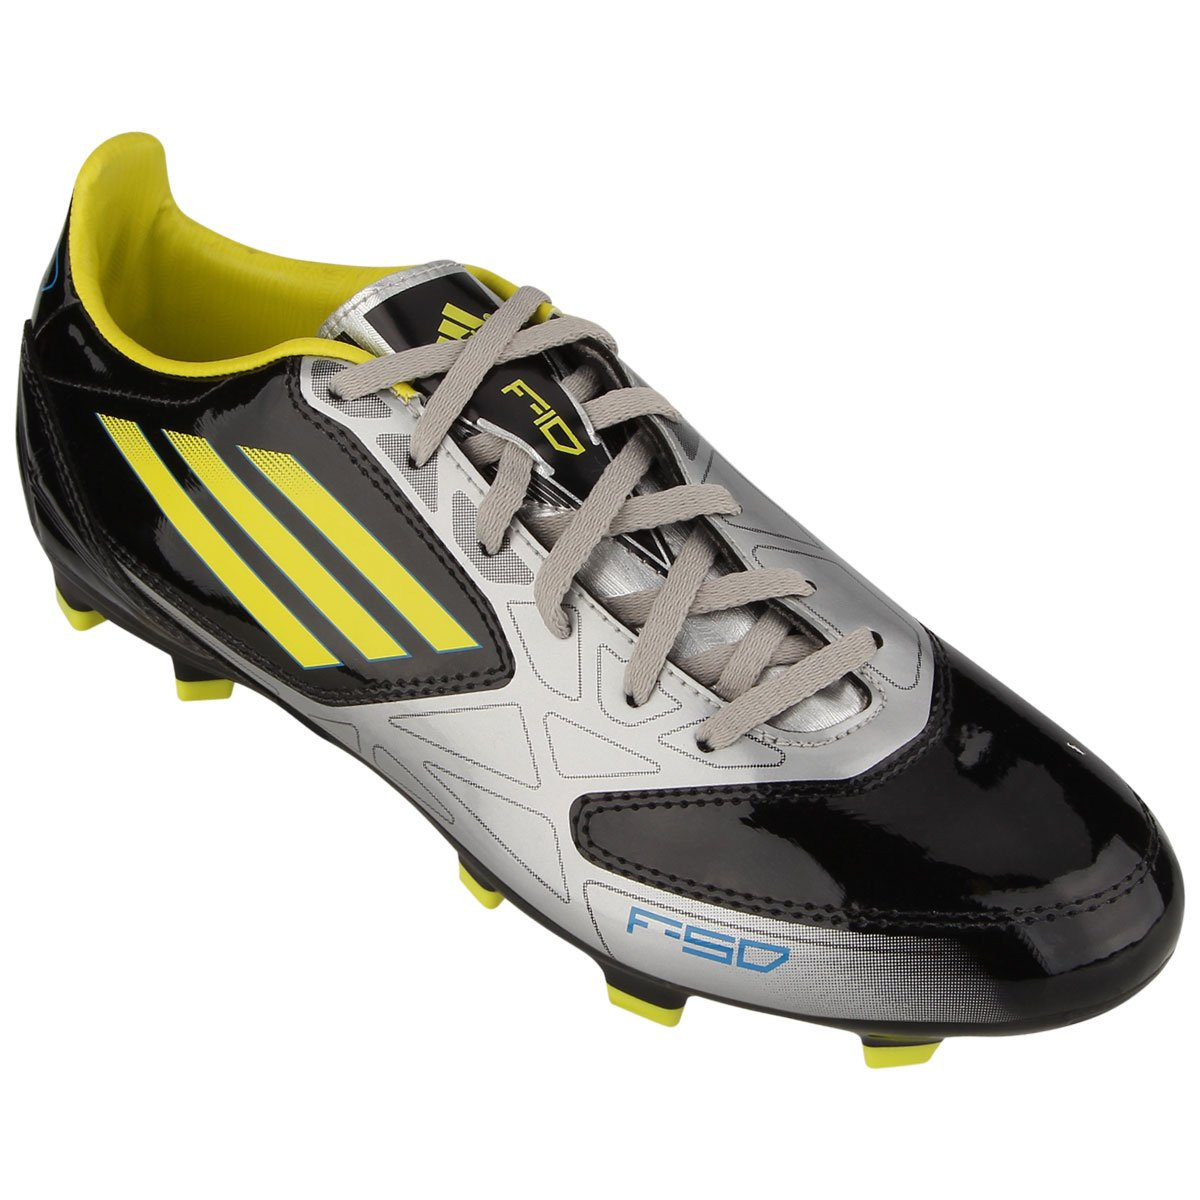 3a028c8005 Chuteira Adidas F10 TRX FG